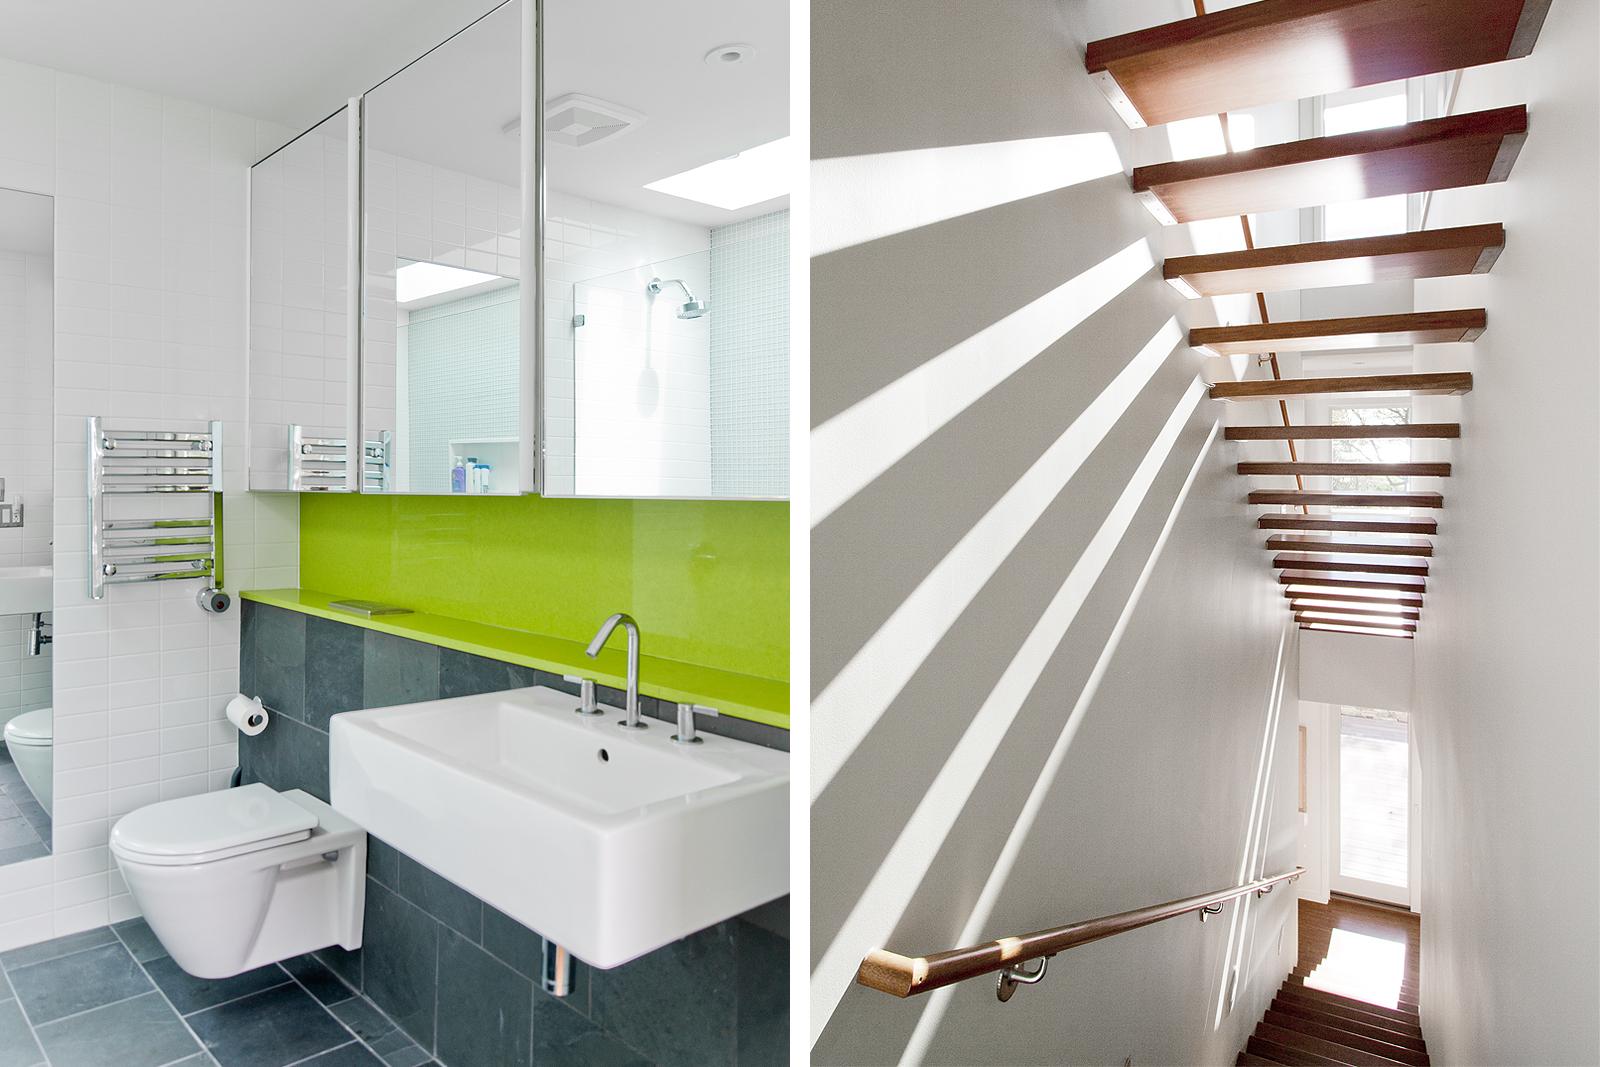 19-res4-resolution-4-architecture-modern-modular-home-prefab-house-fishers-island-interior-bath-room-stairs.jpg